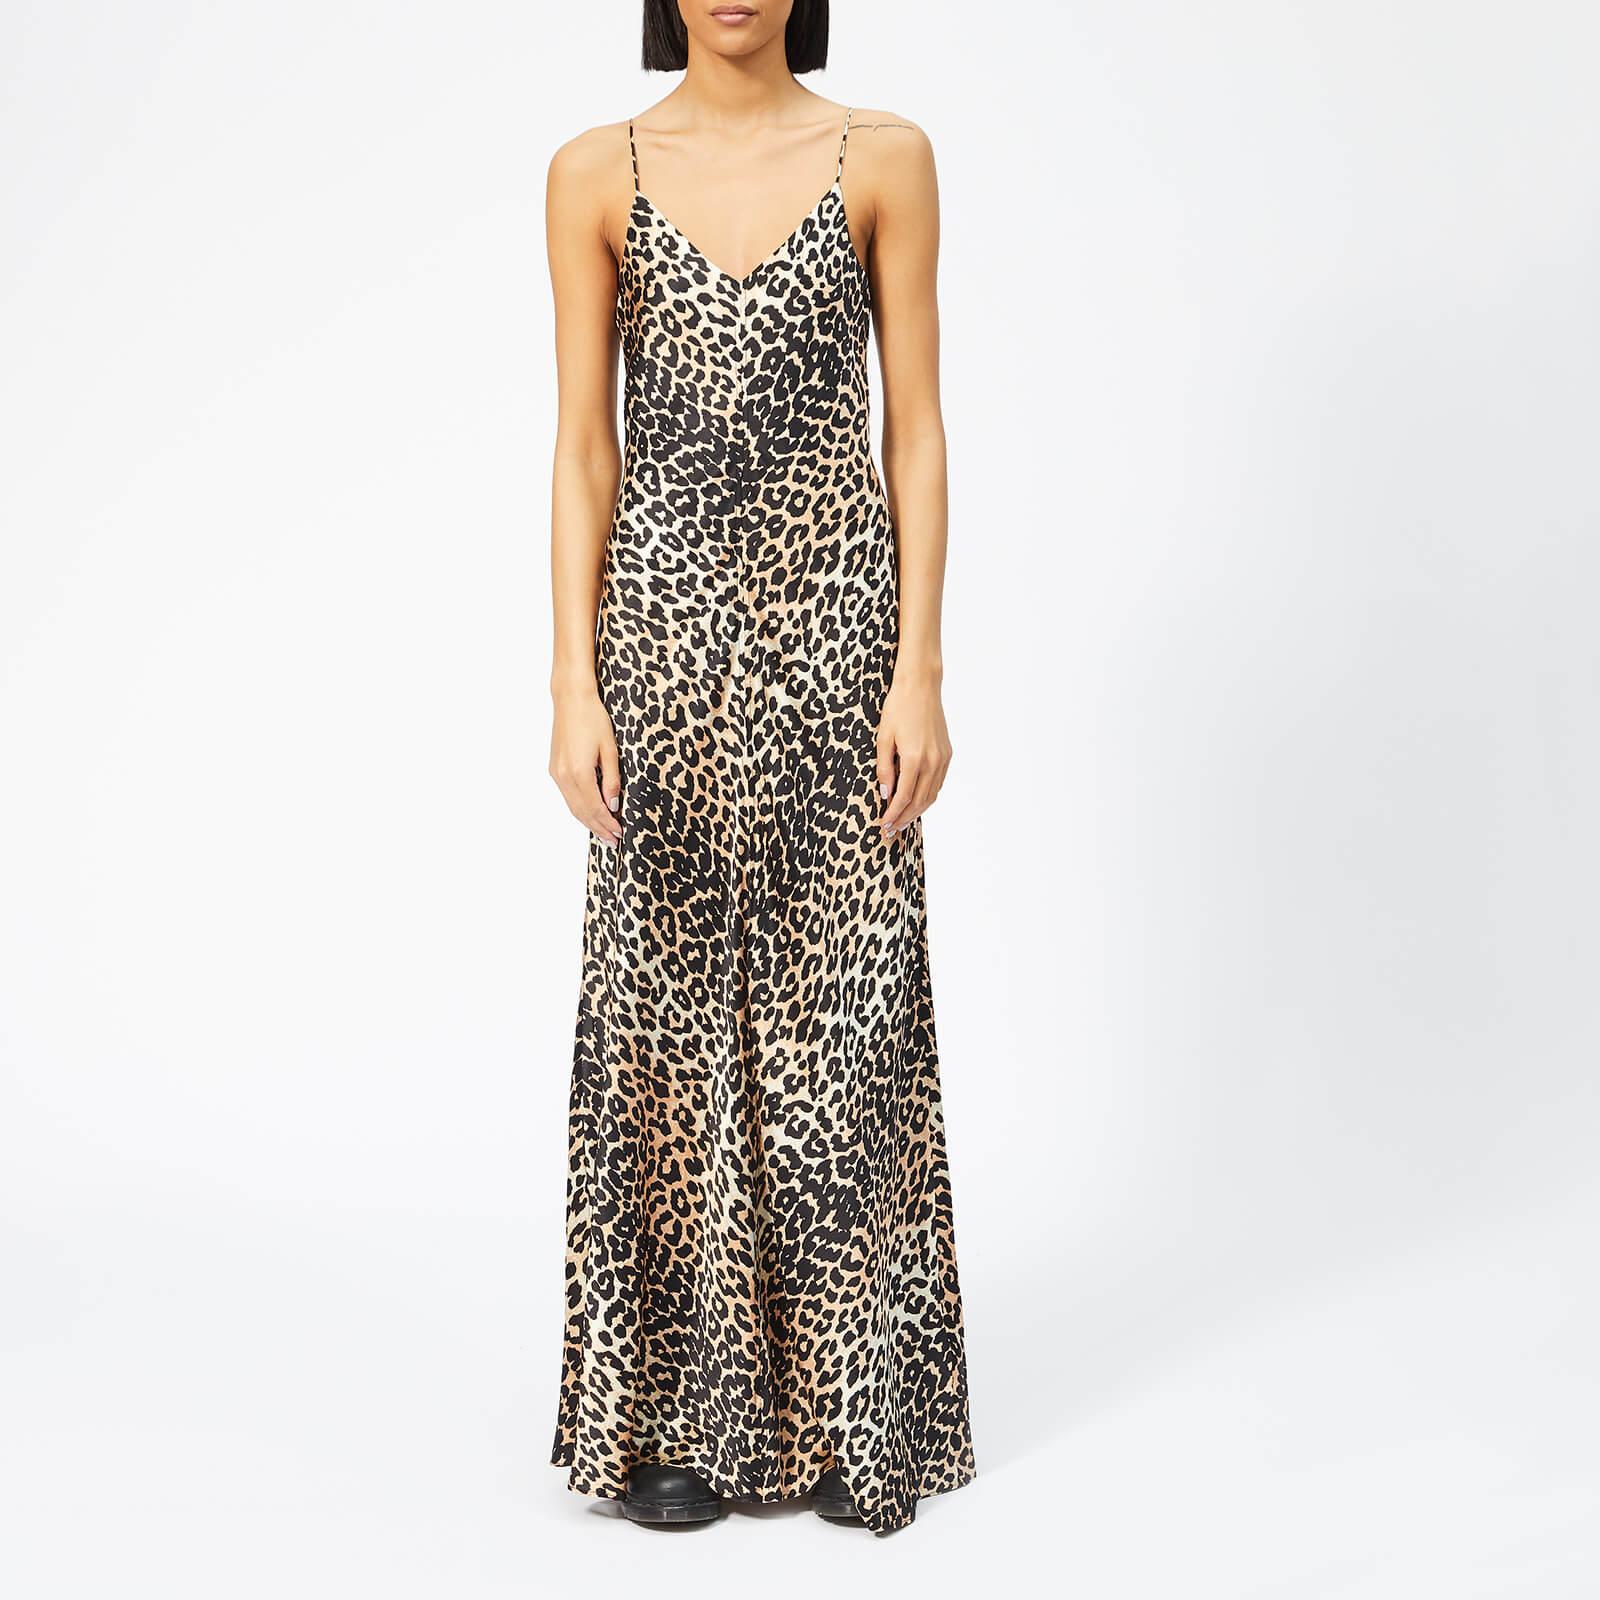 0fb6a80fec9b Ganni Women's Blakely Silk Slip Dress - Leopard - Free UK Delivery over £50